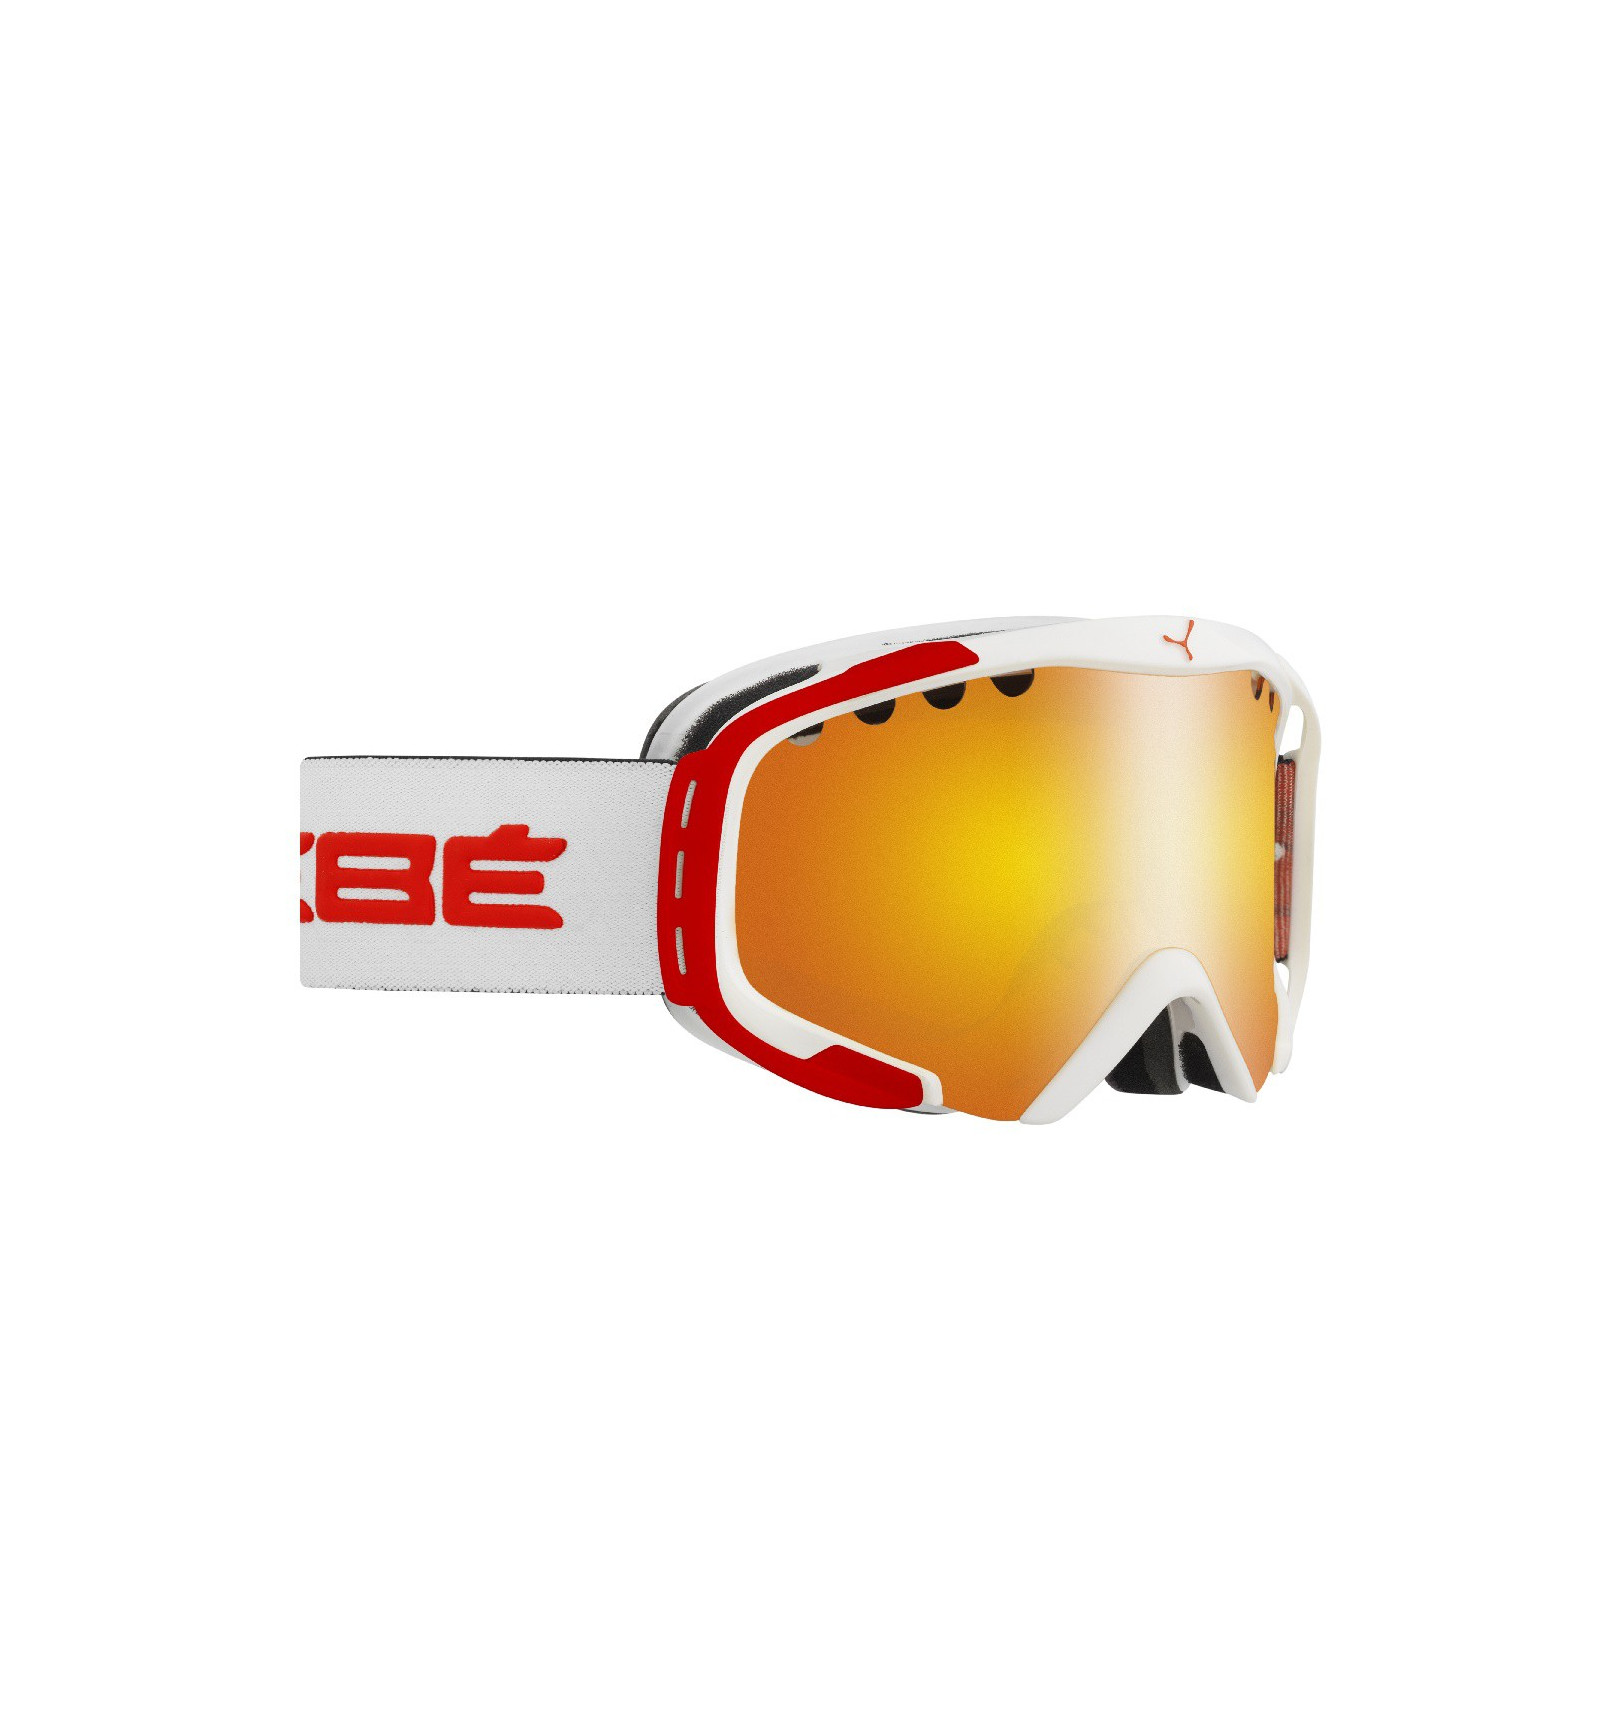 masque de ski c b hurricane m alpinstore. Black Bedroom Furniture Sets. Home Design Ideas